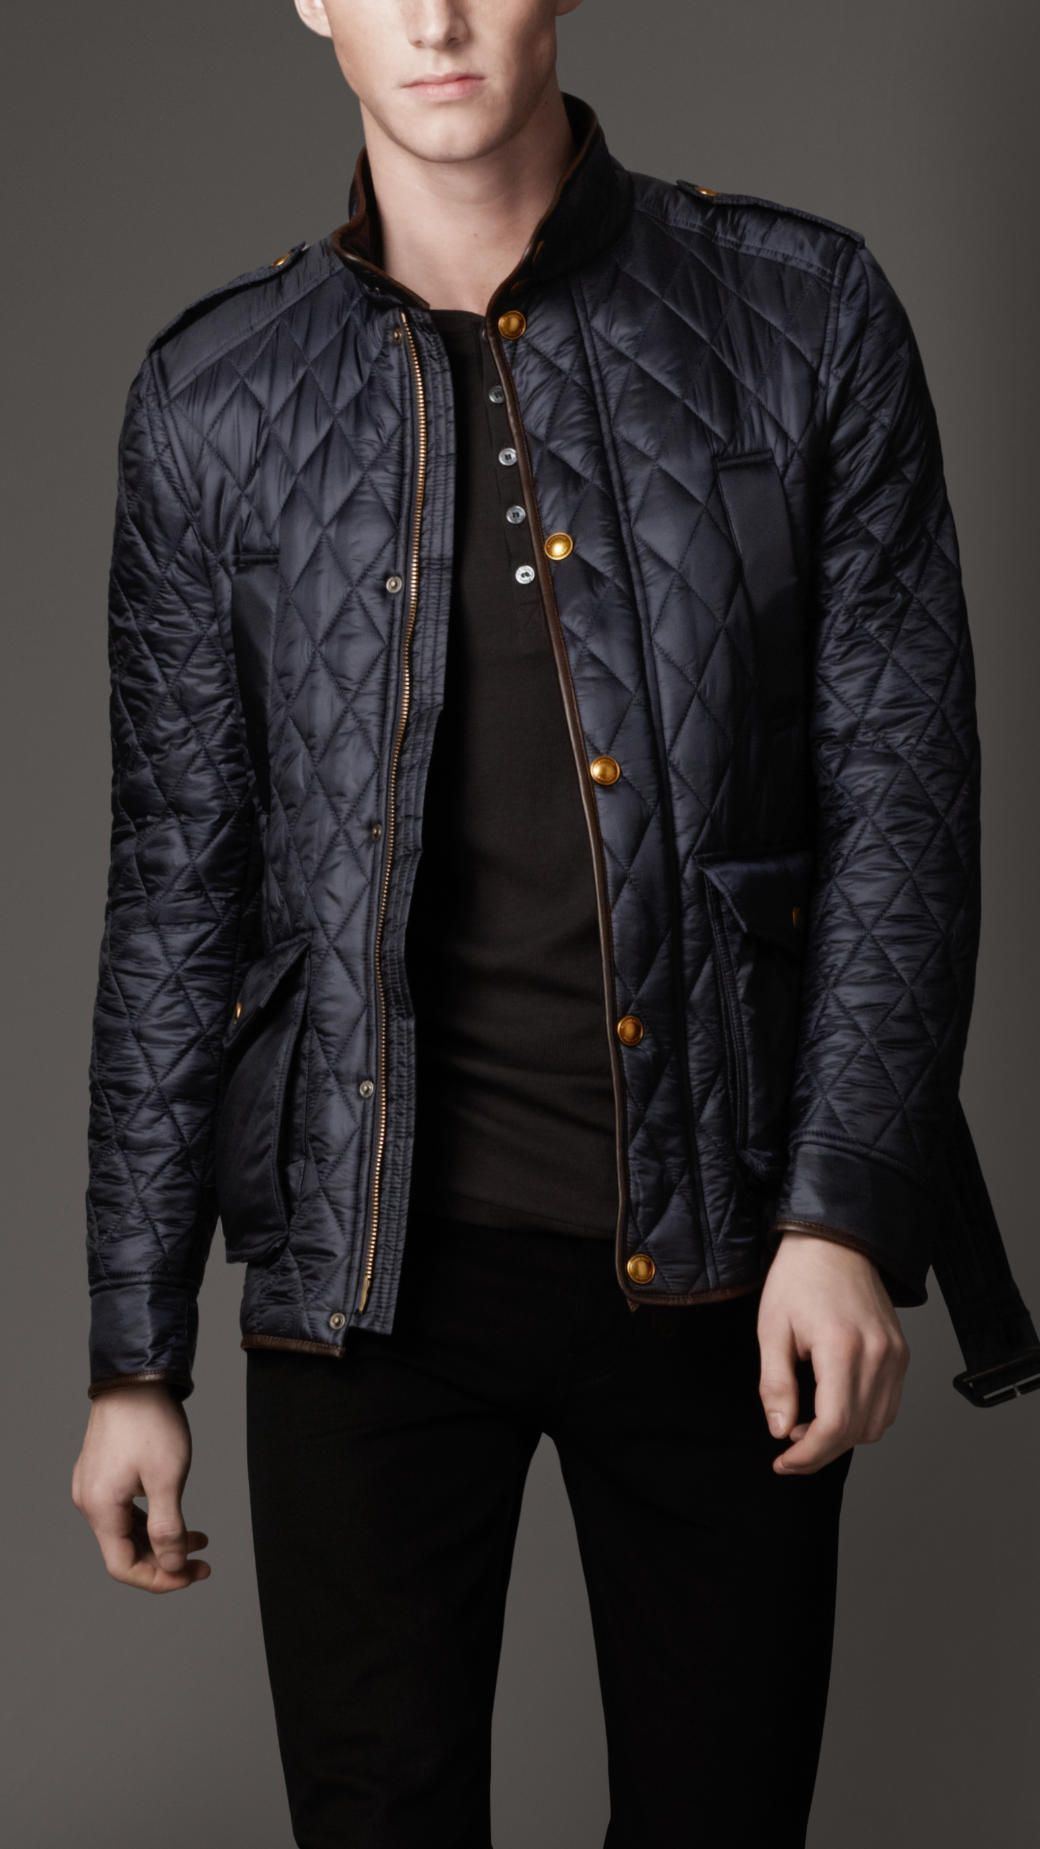 595 Burberry Diamond Quilted Harrington Jacket Black Quilted Jacket Harrington Jacket Designer Clothes For Men